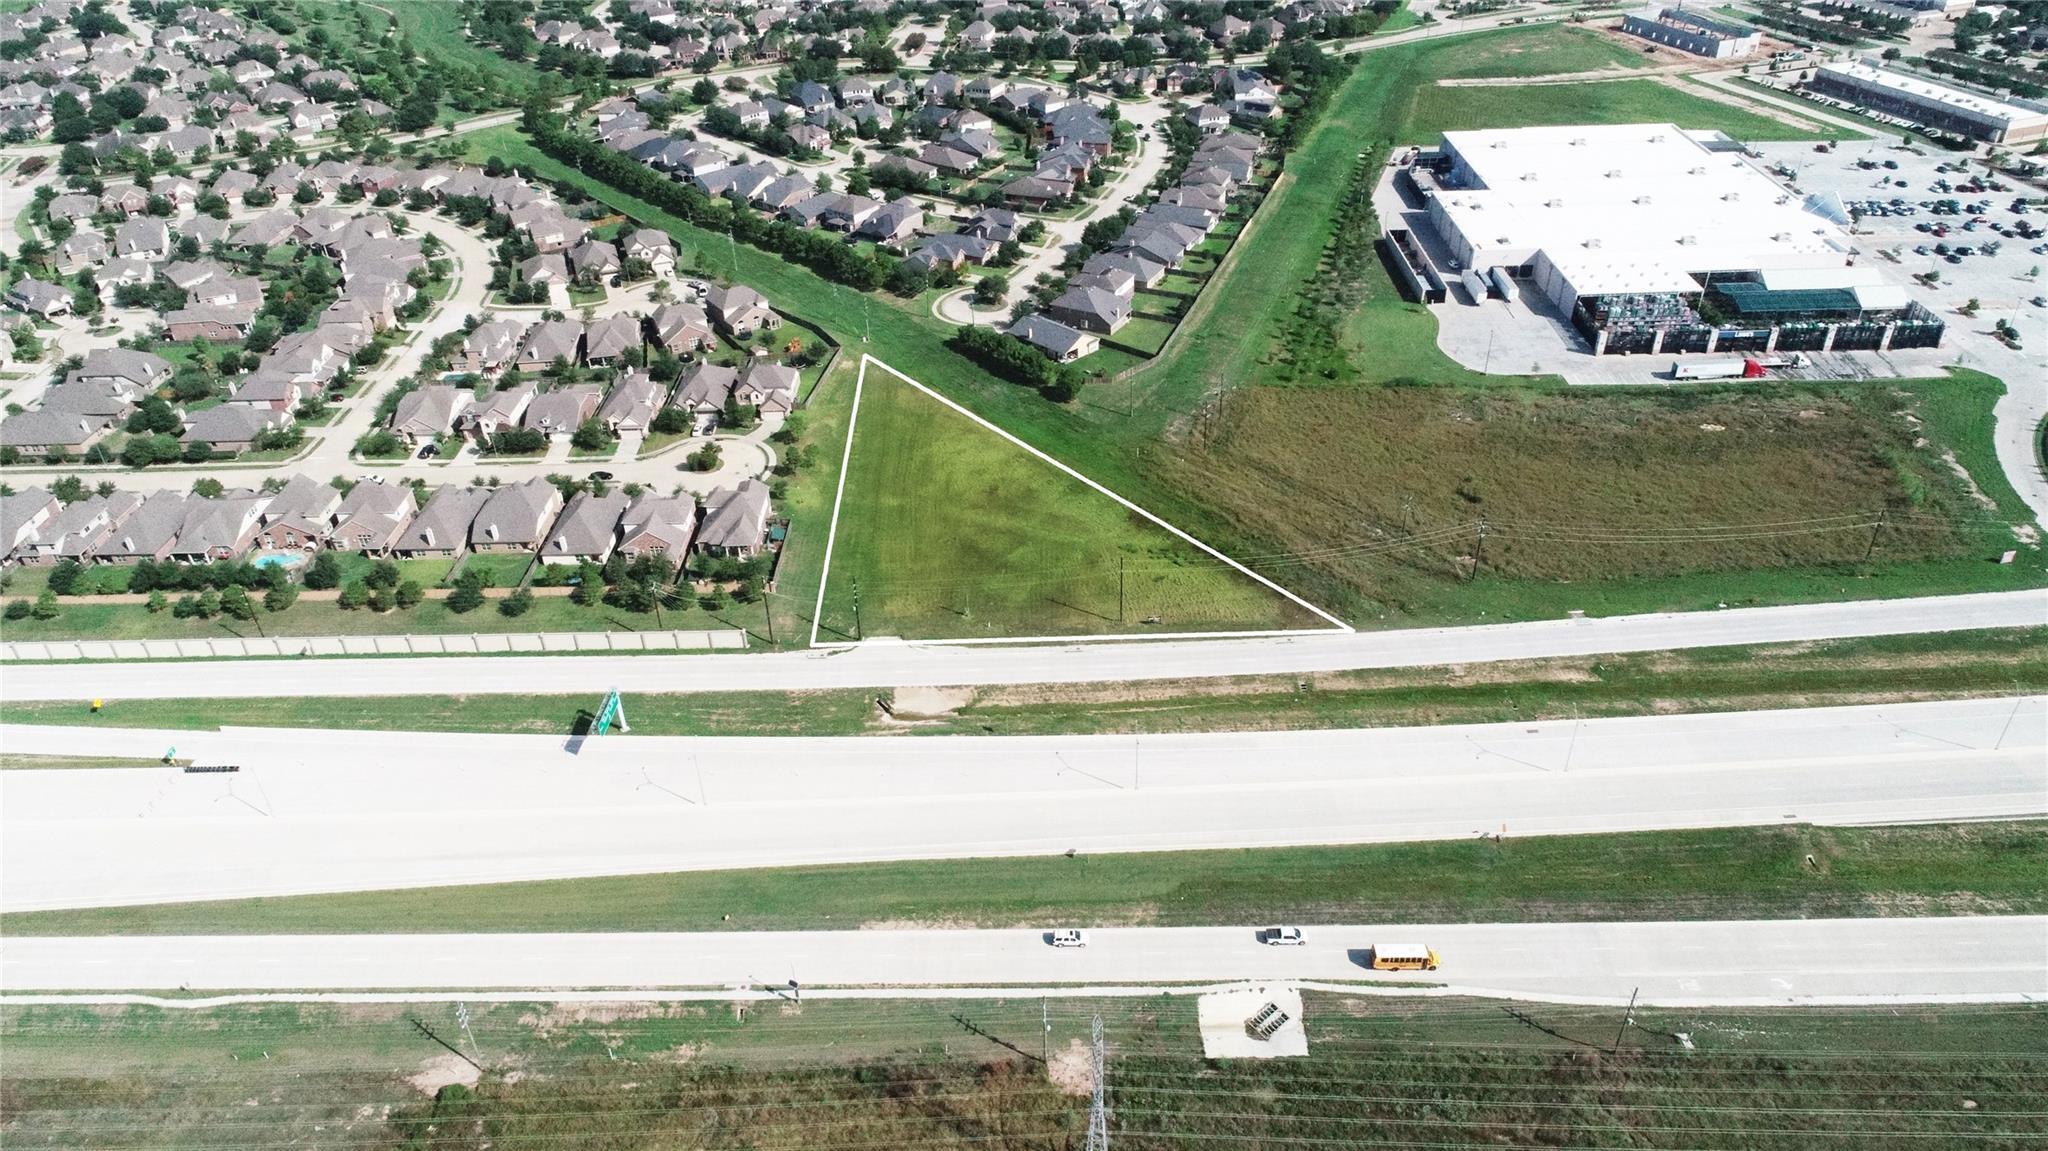 00 Fm 1093 Property Photo - Katy, TX real estate listing